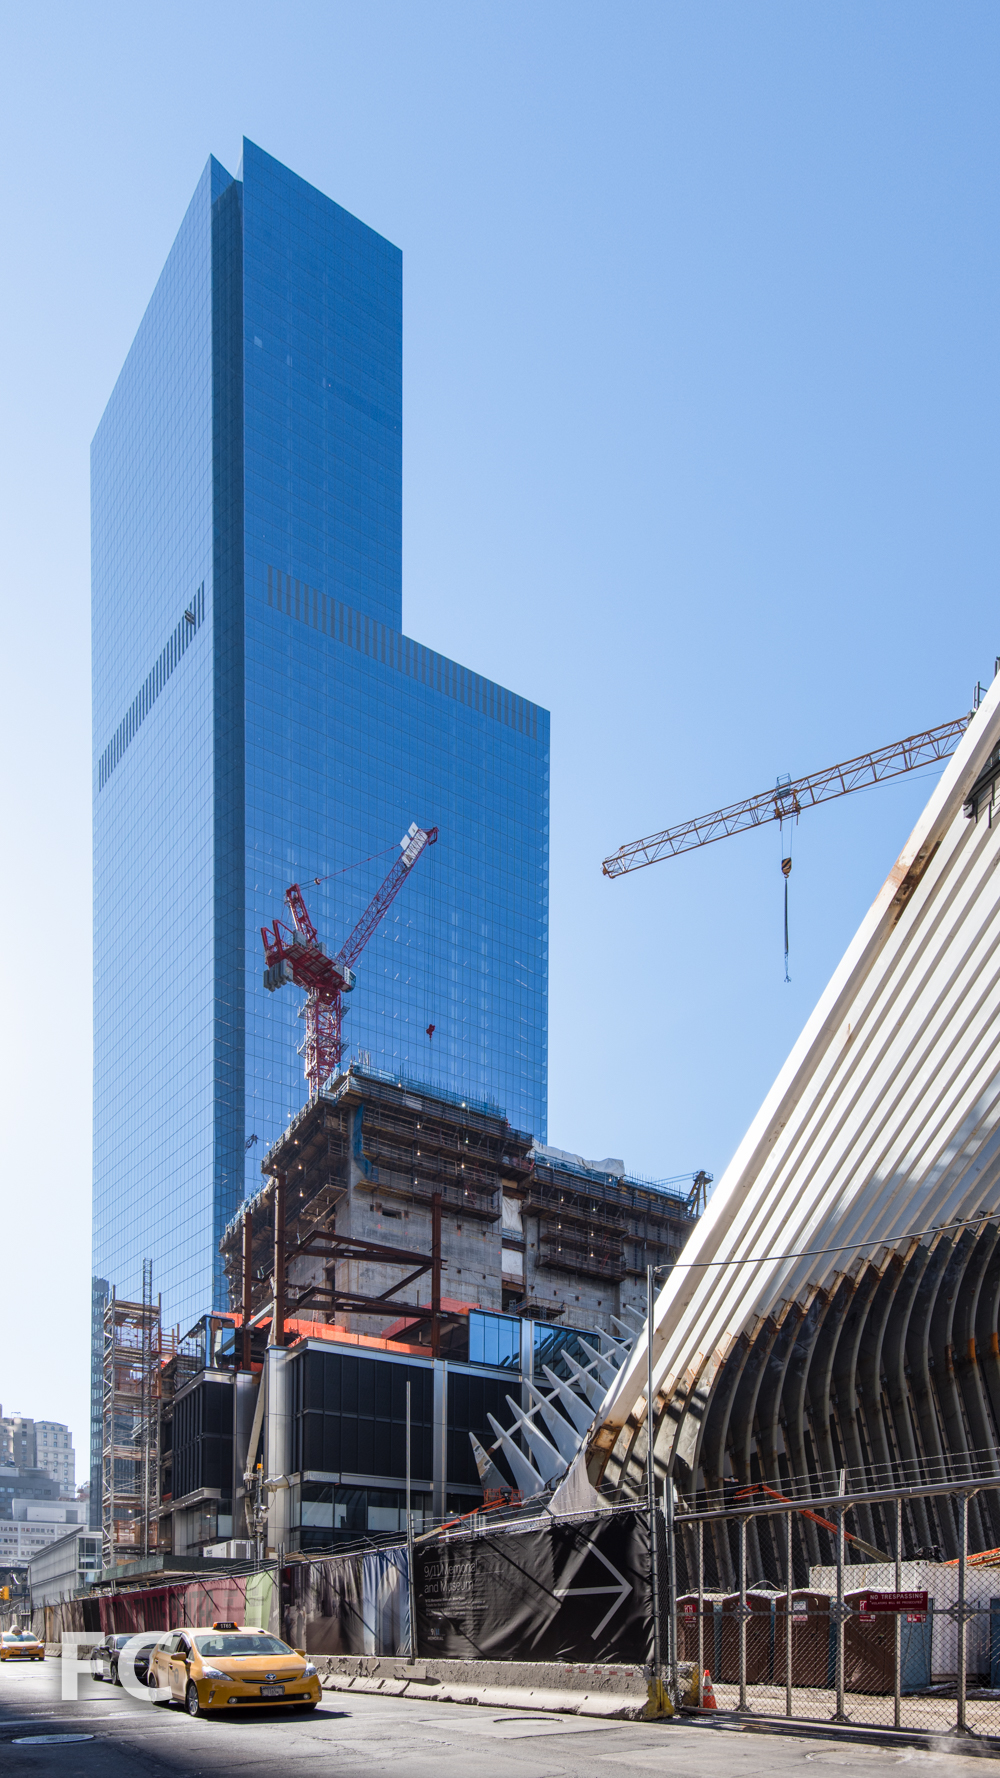 World Trade Center Transit Hub (right), 3 World Trade Center (center), and 4 World Trade Center (left) from ChurchStreet.